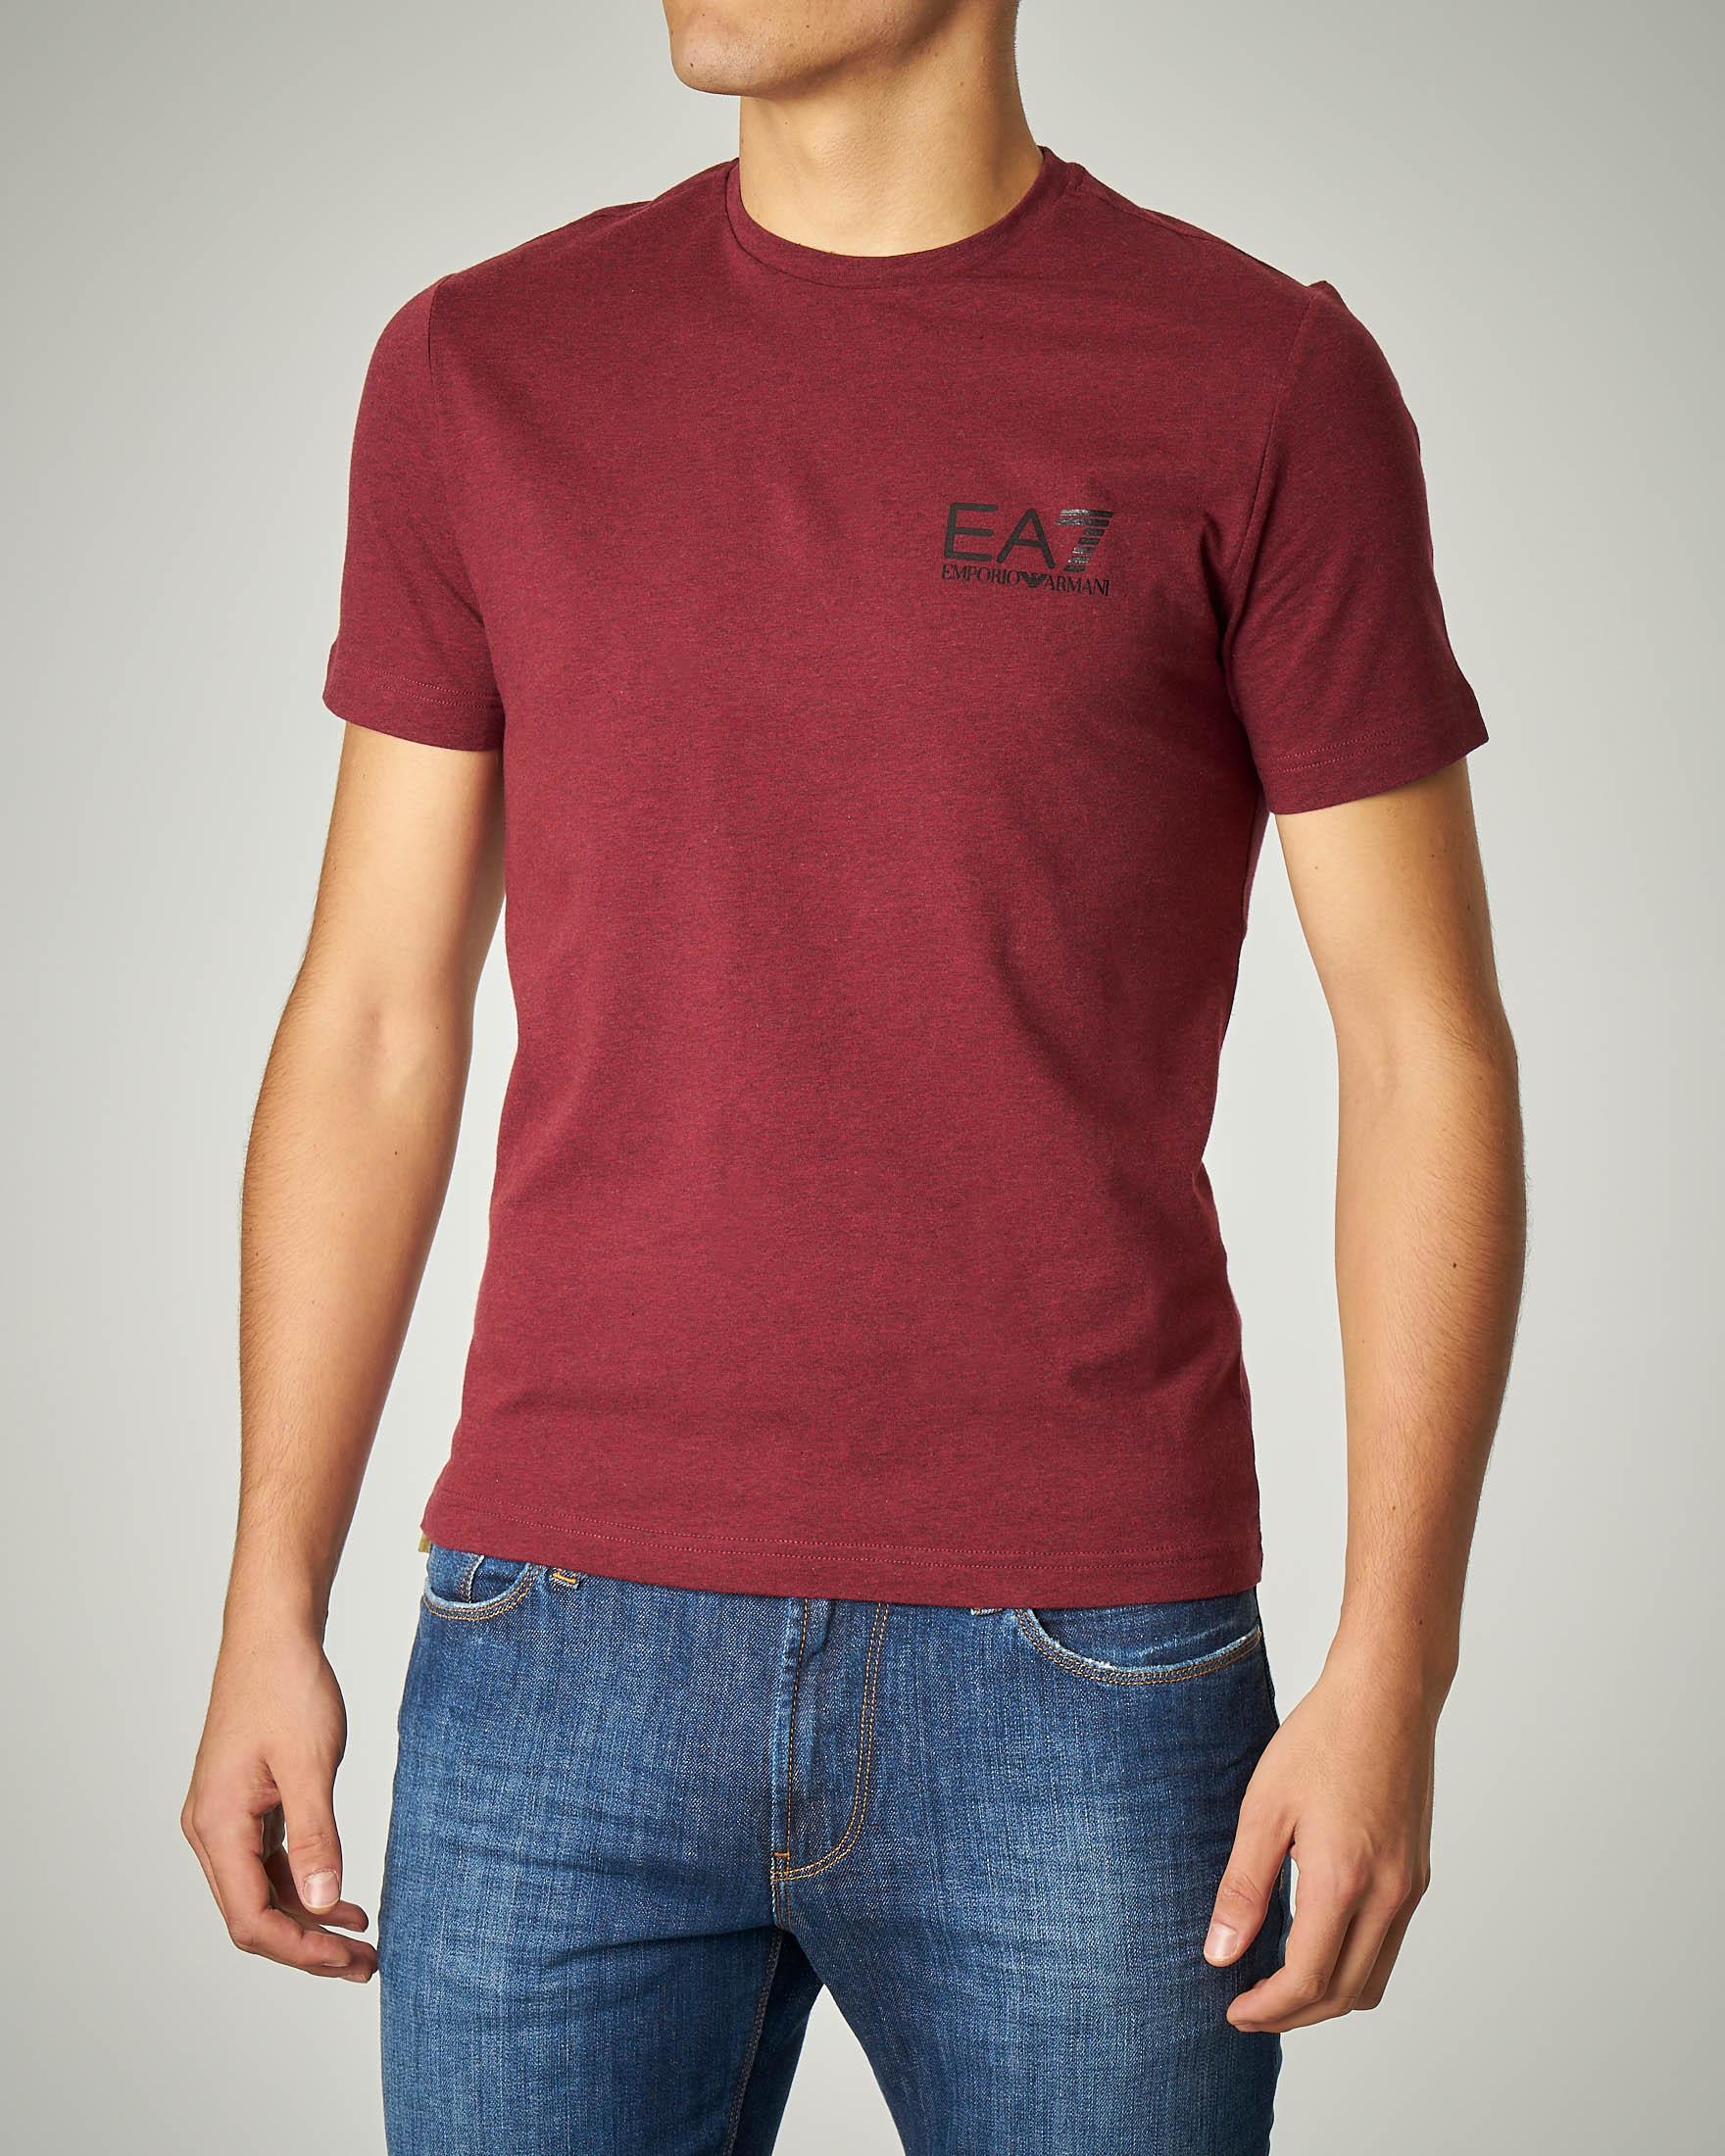 T-shirt bordeaux in cotone stretch